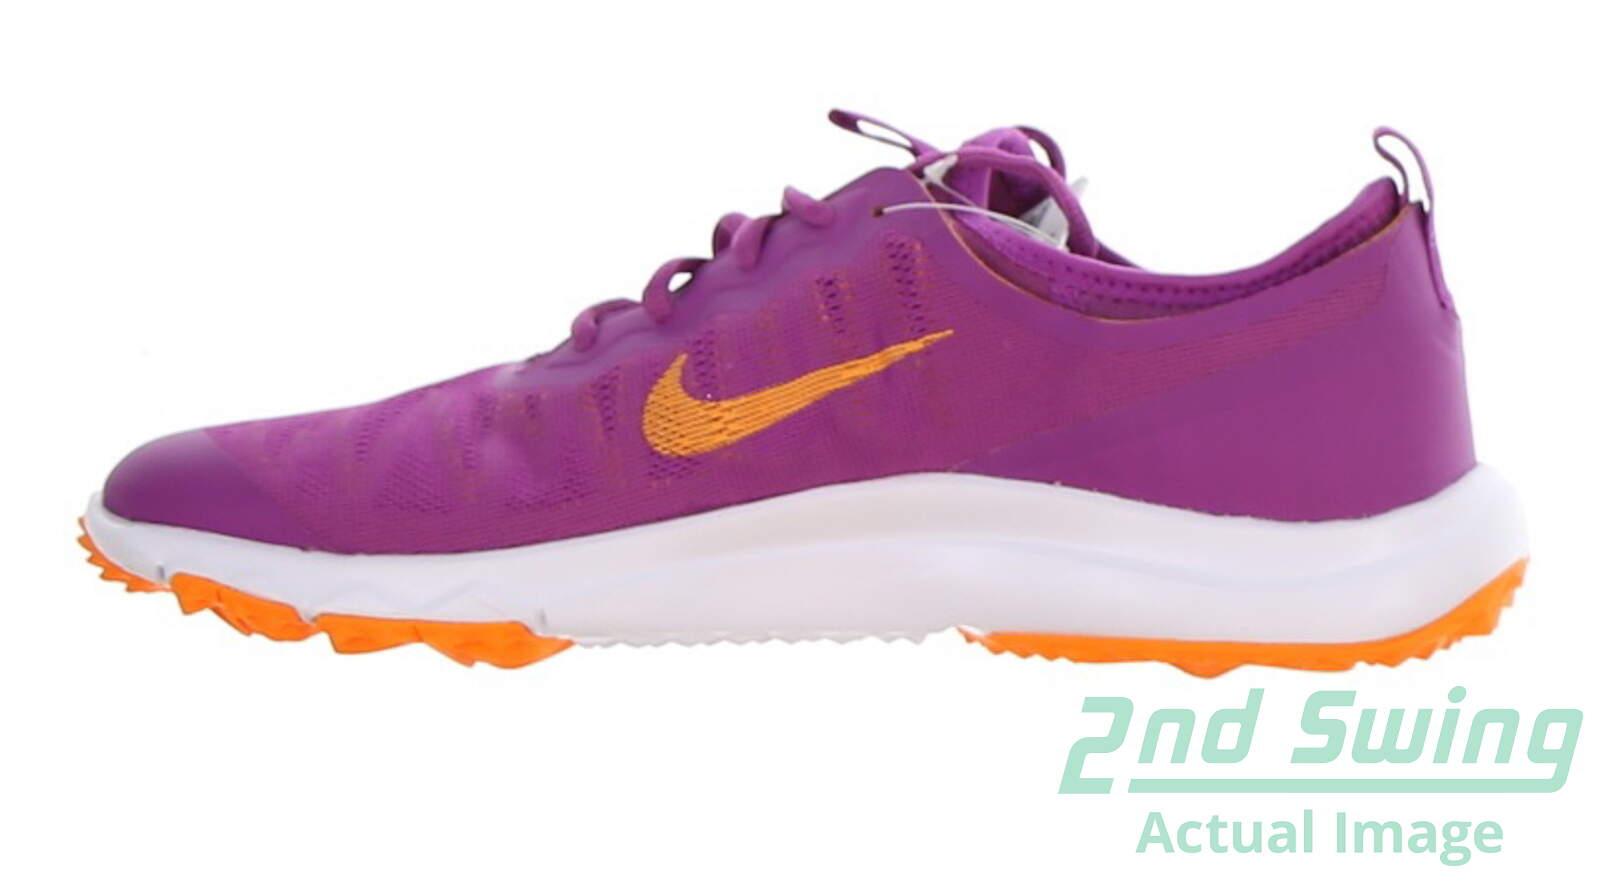 6f2b8041e6a2 New Womens Golf Shoe Nike FI Bermuda 10 Purple MSRP  110 776089 500 - Golf  Footwear